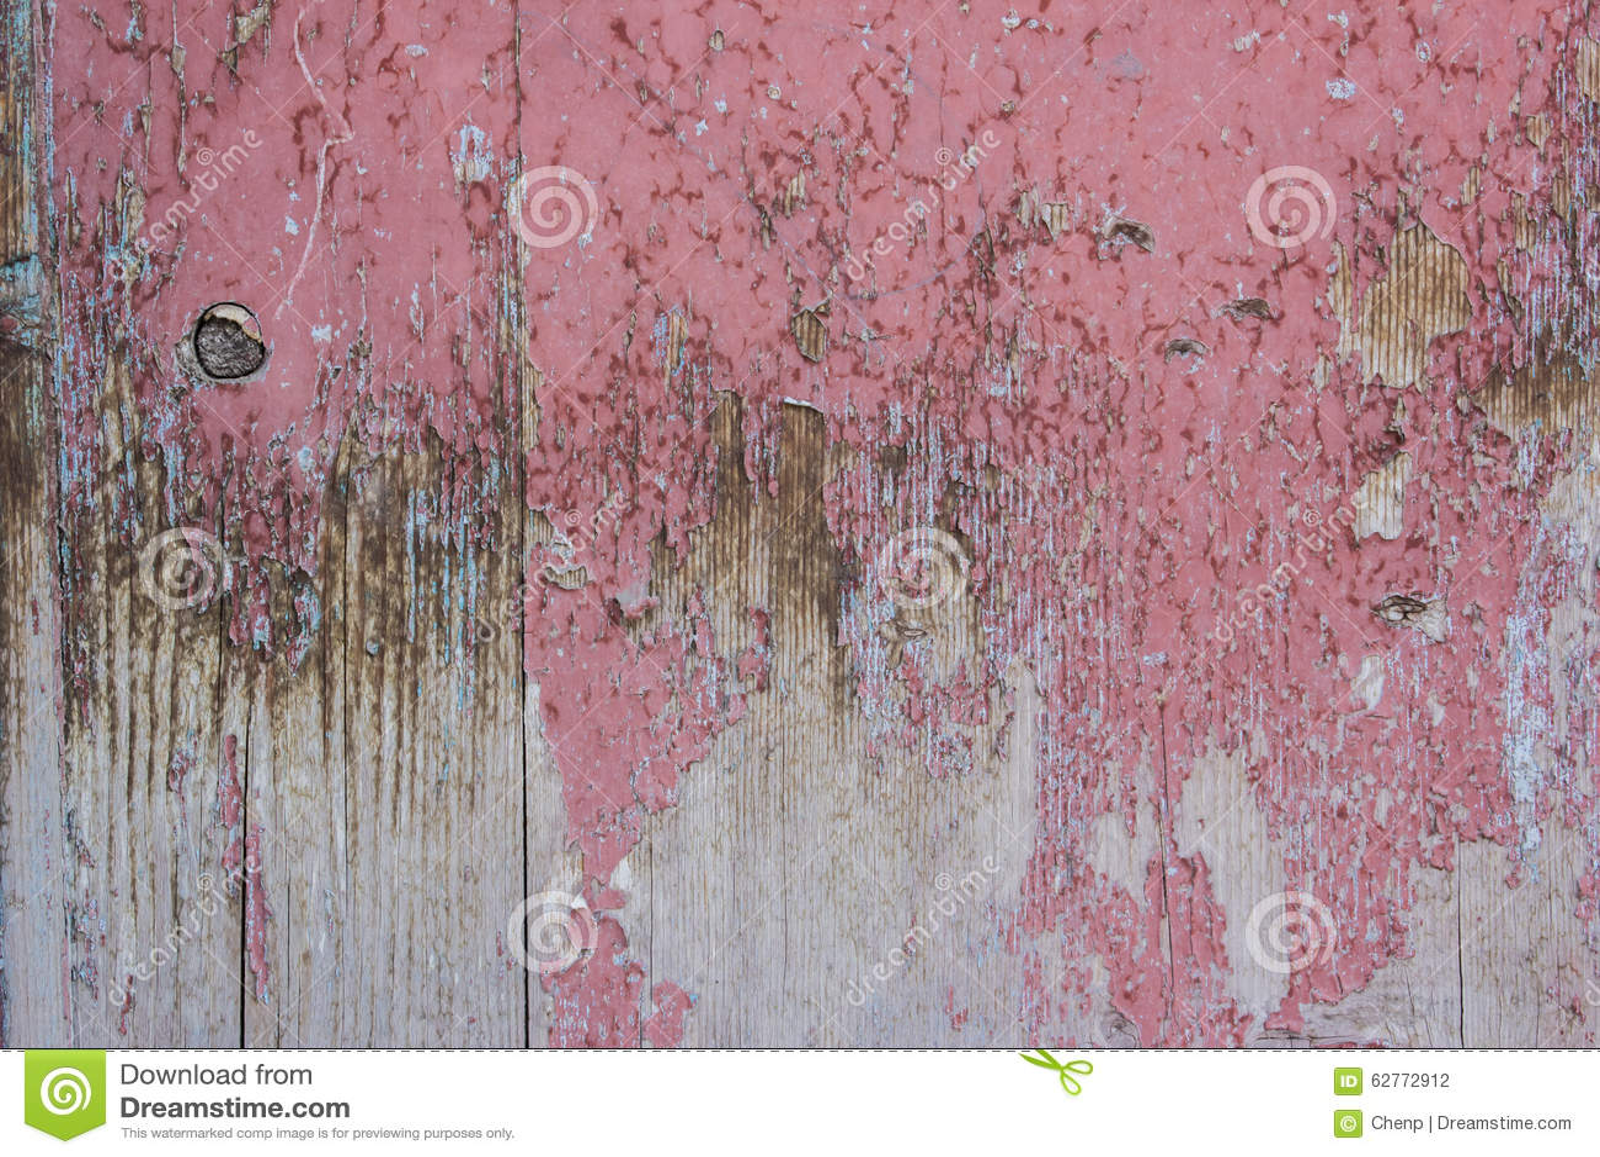 Rote Graue Farbe Gesprenkelte Holztüren Stockfoto - Bild: 62772912